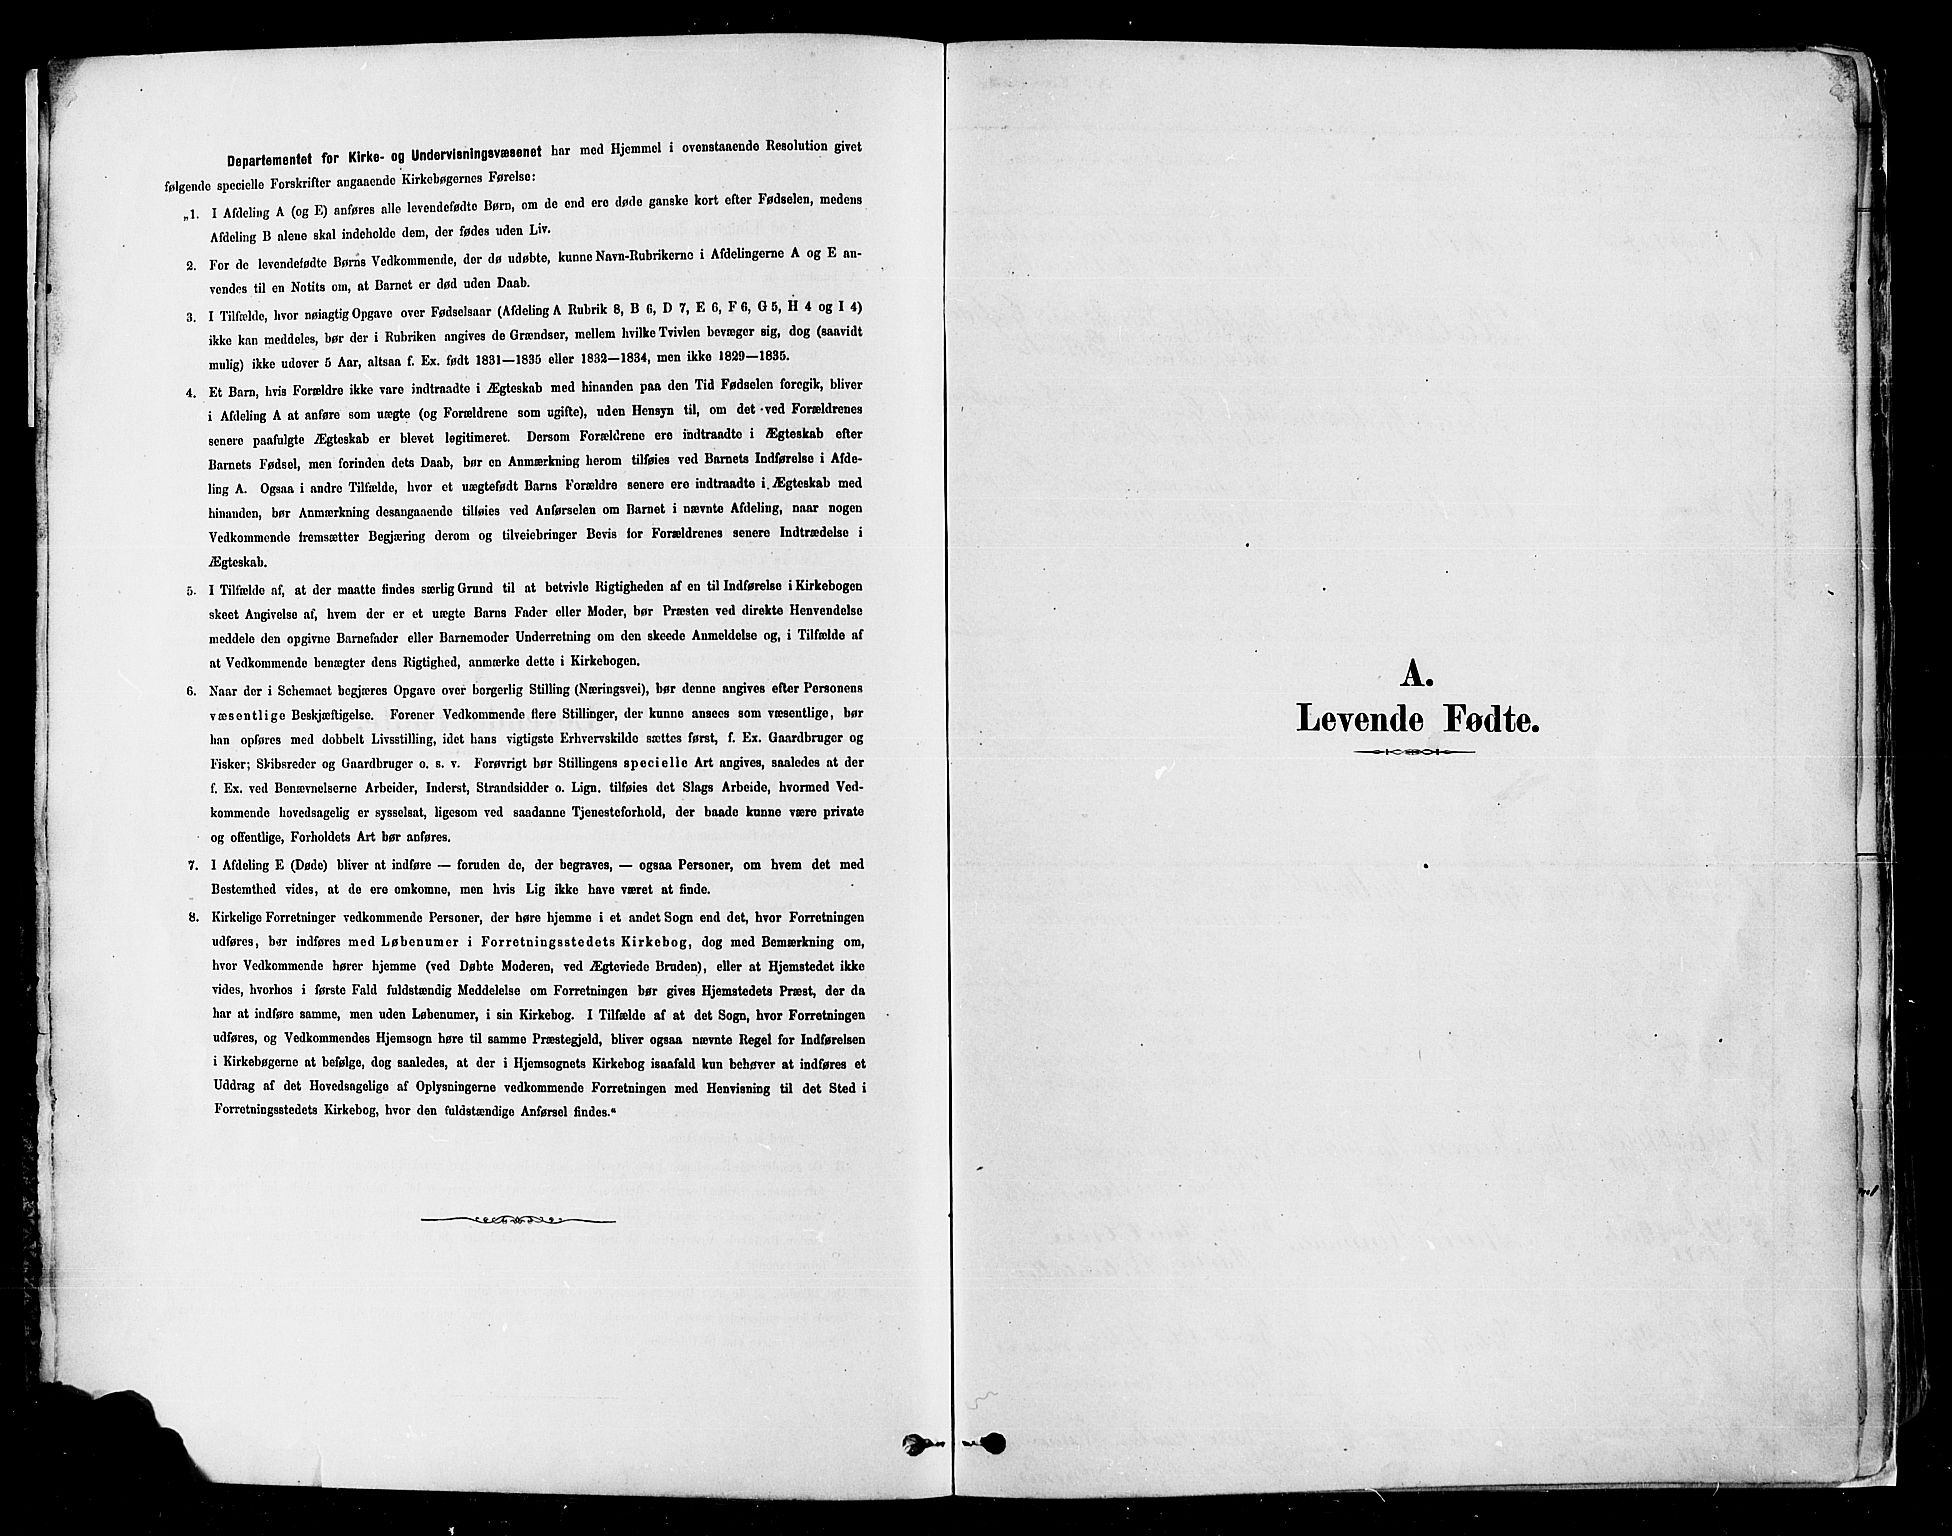 SAH, Vestre Toten prestekontor, H/Ha/Haa/L0009: Ministerialbok nr. 9, 1878-1894